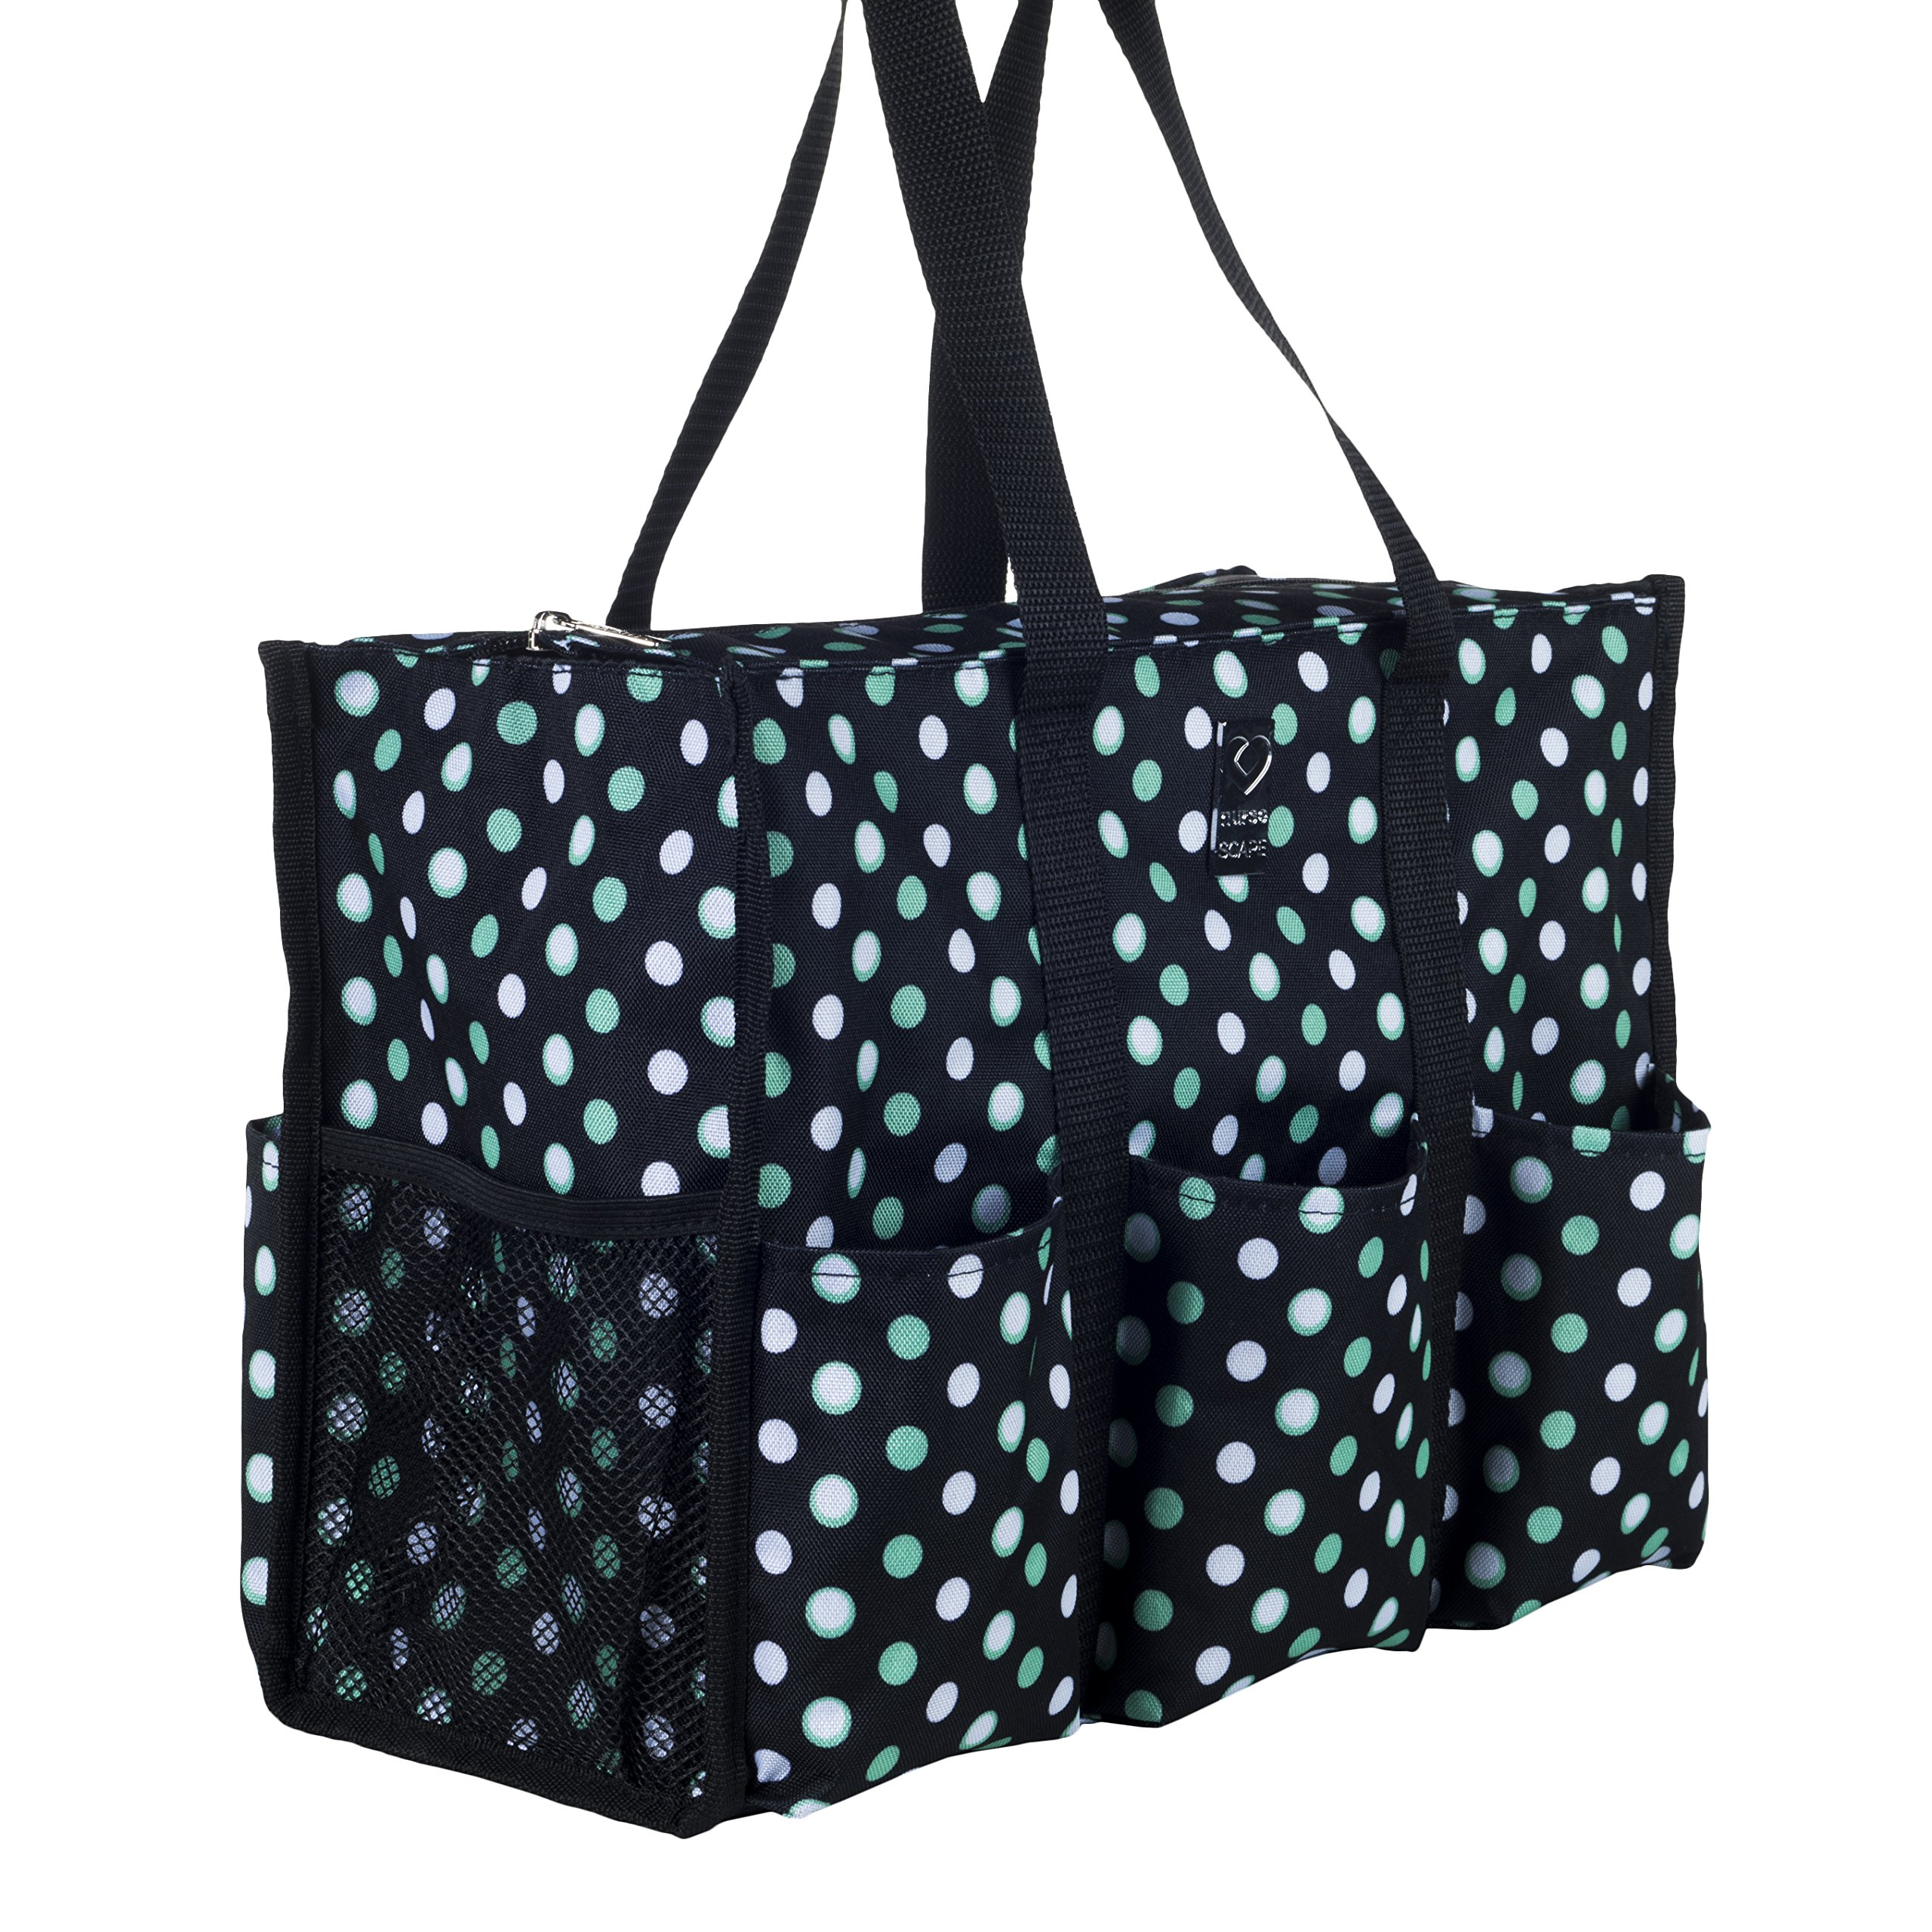 Nursescape Nurse Bag with 13 Exterior & Interior Pockets - Perfect Nursing Tote for Registered Nurses, Nursing Students, Travel Nurses and More (Gradient Dots)